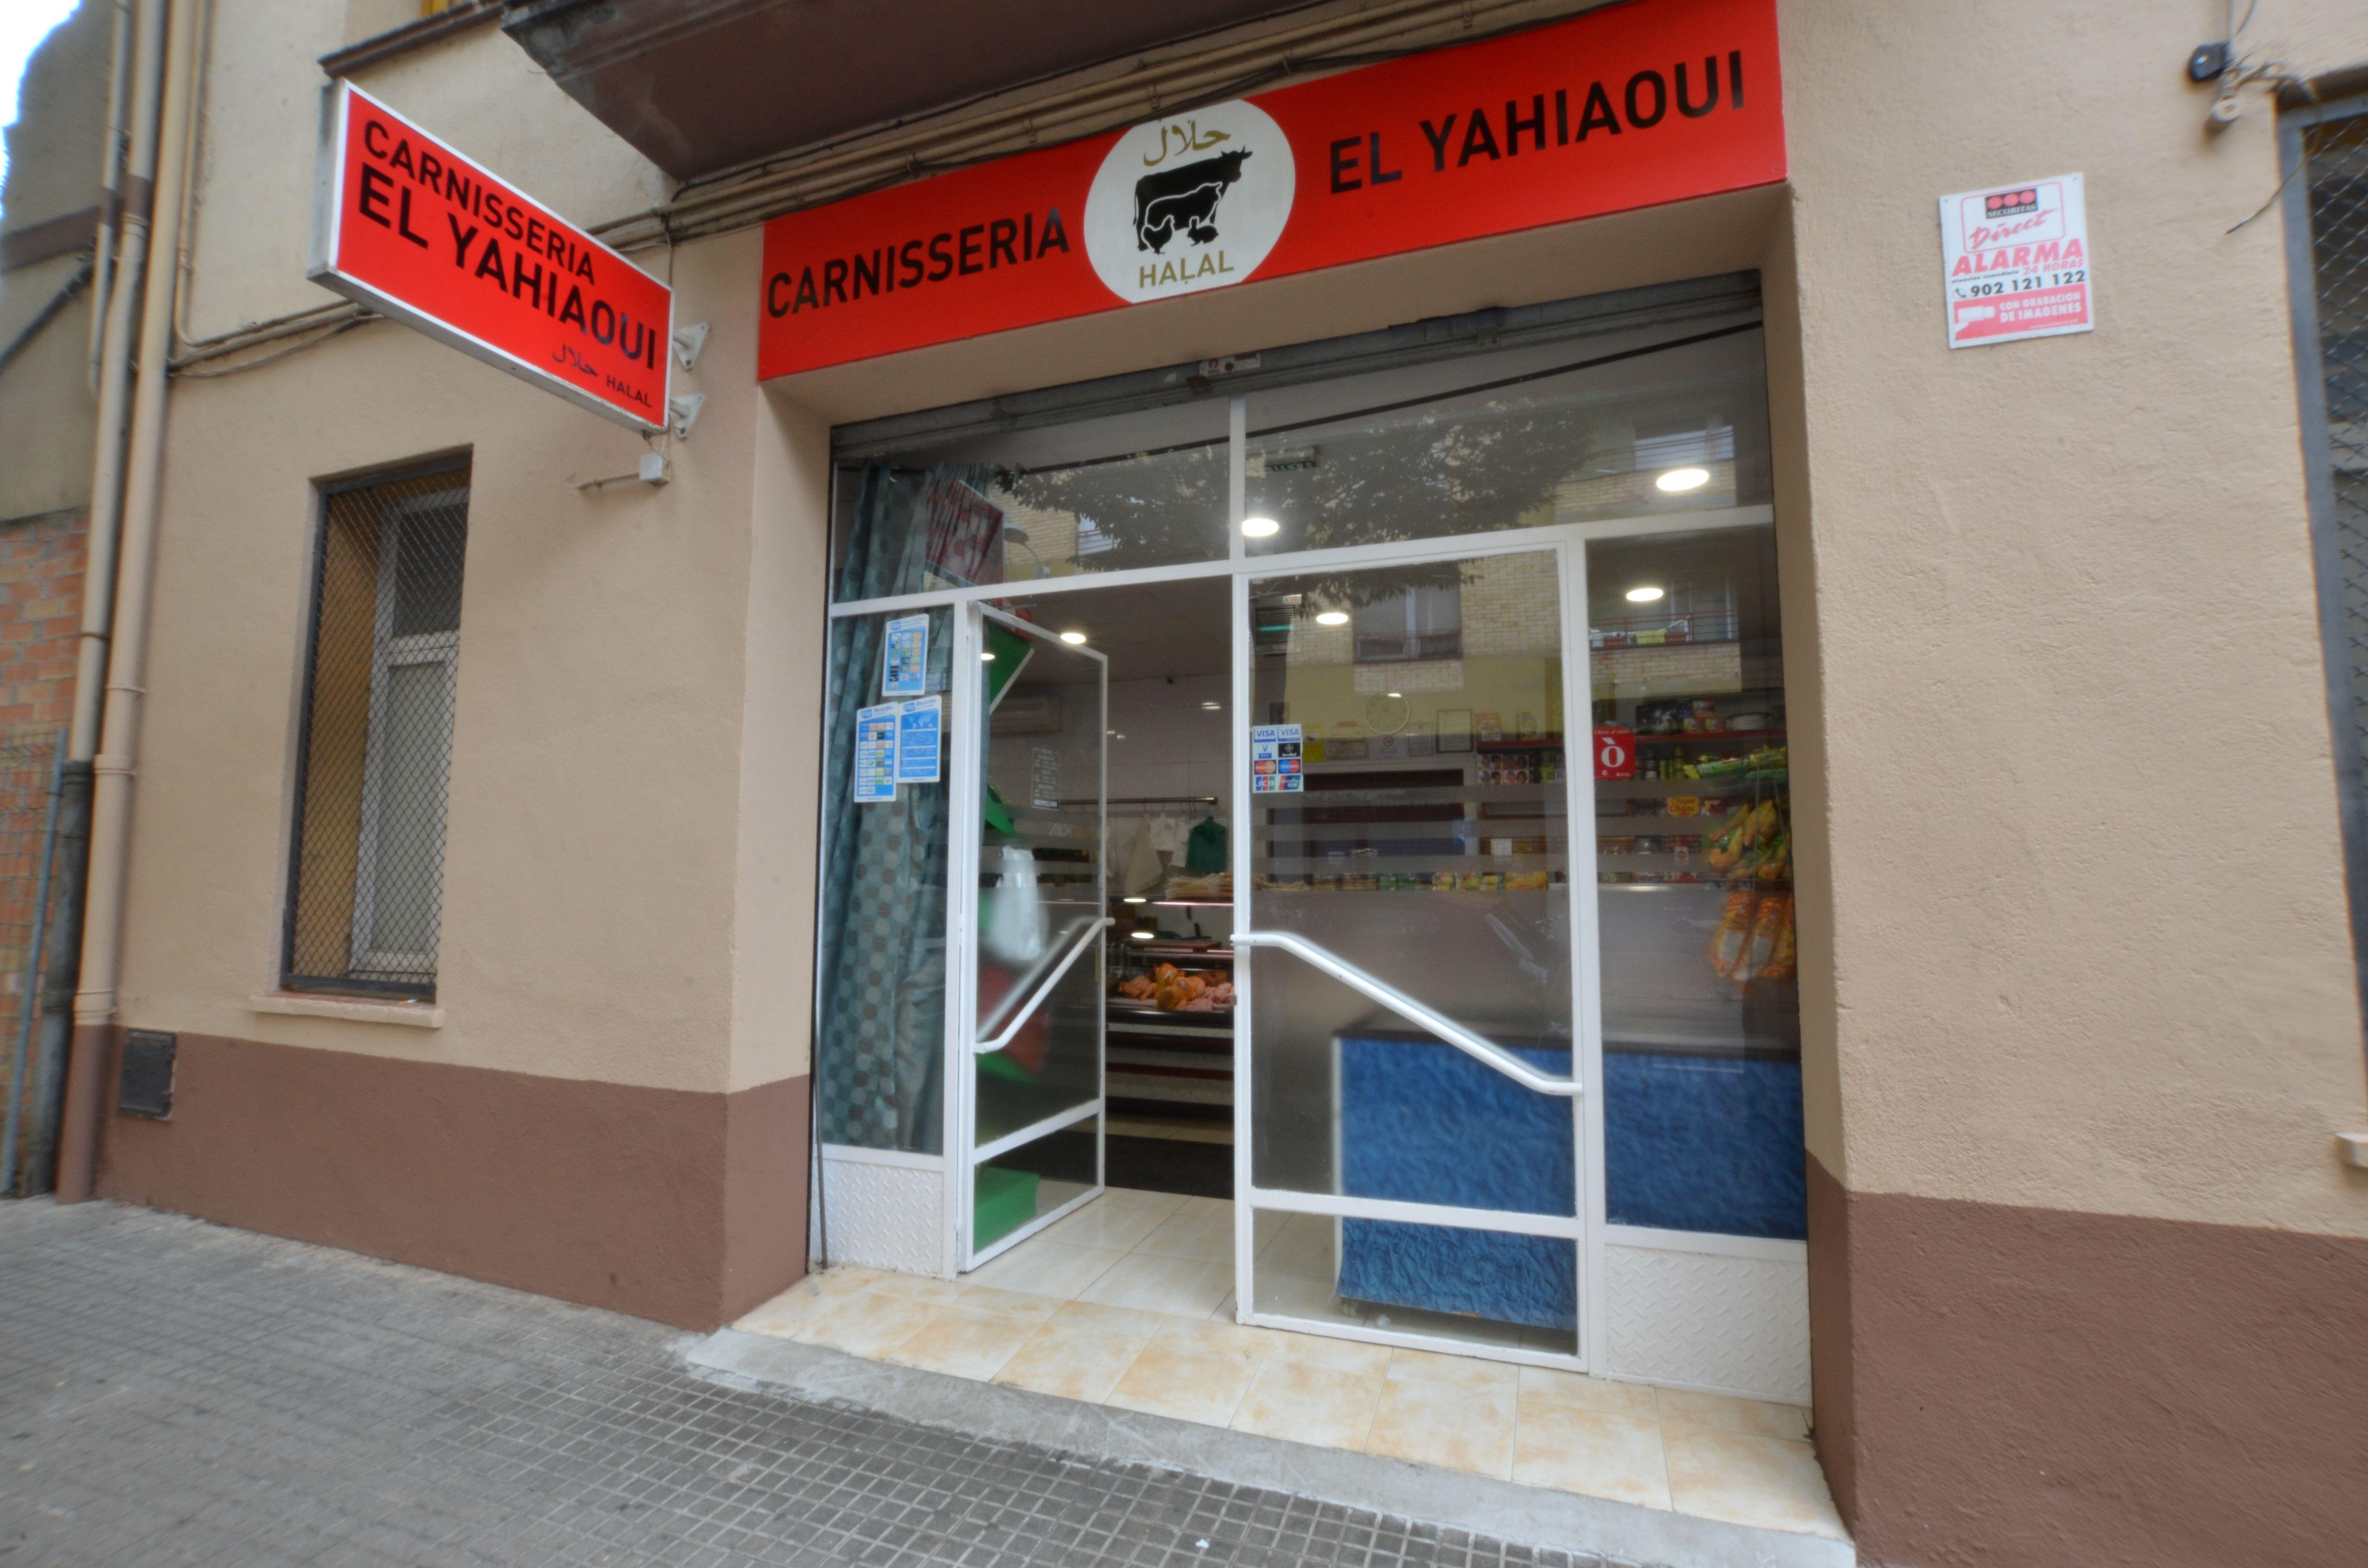 Venta de ternera de Girona en Olot